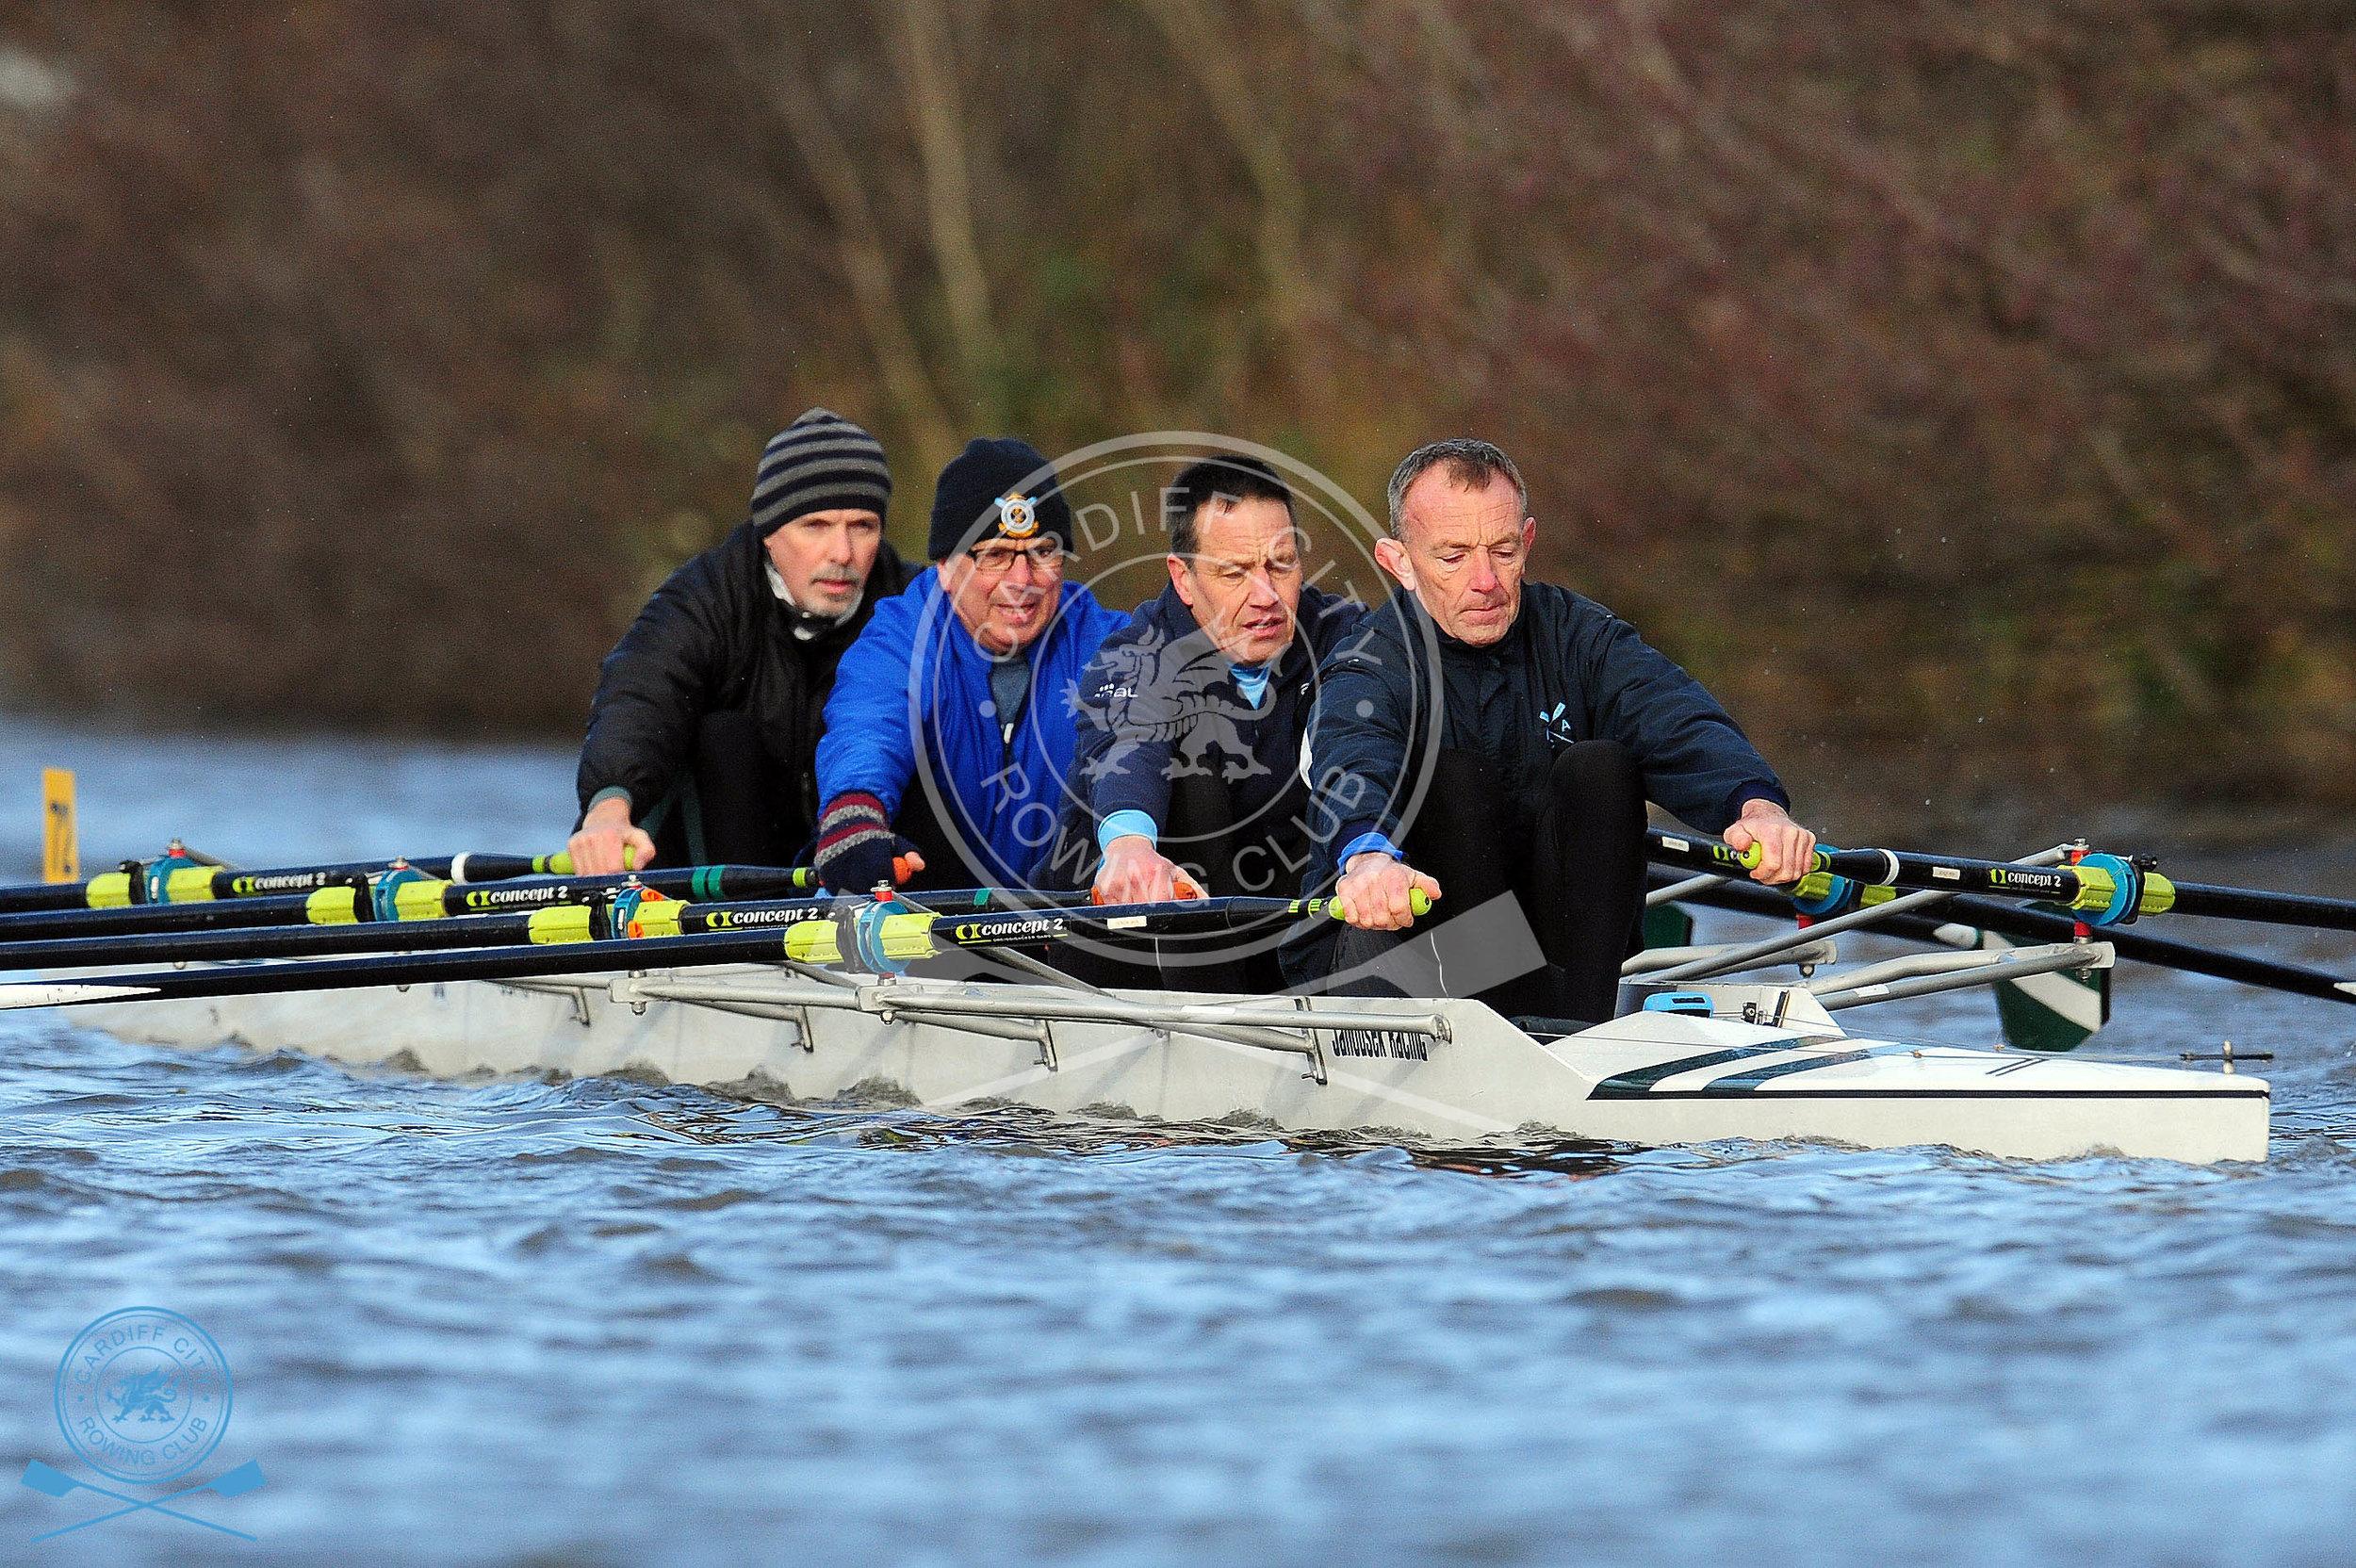 DW_280119_Cardiff_City_Rowing_211.jpg